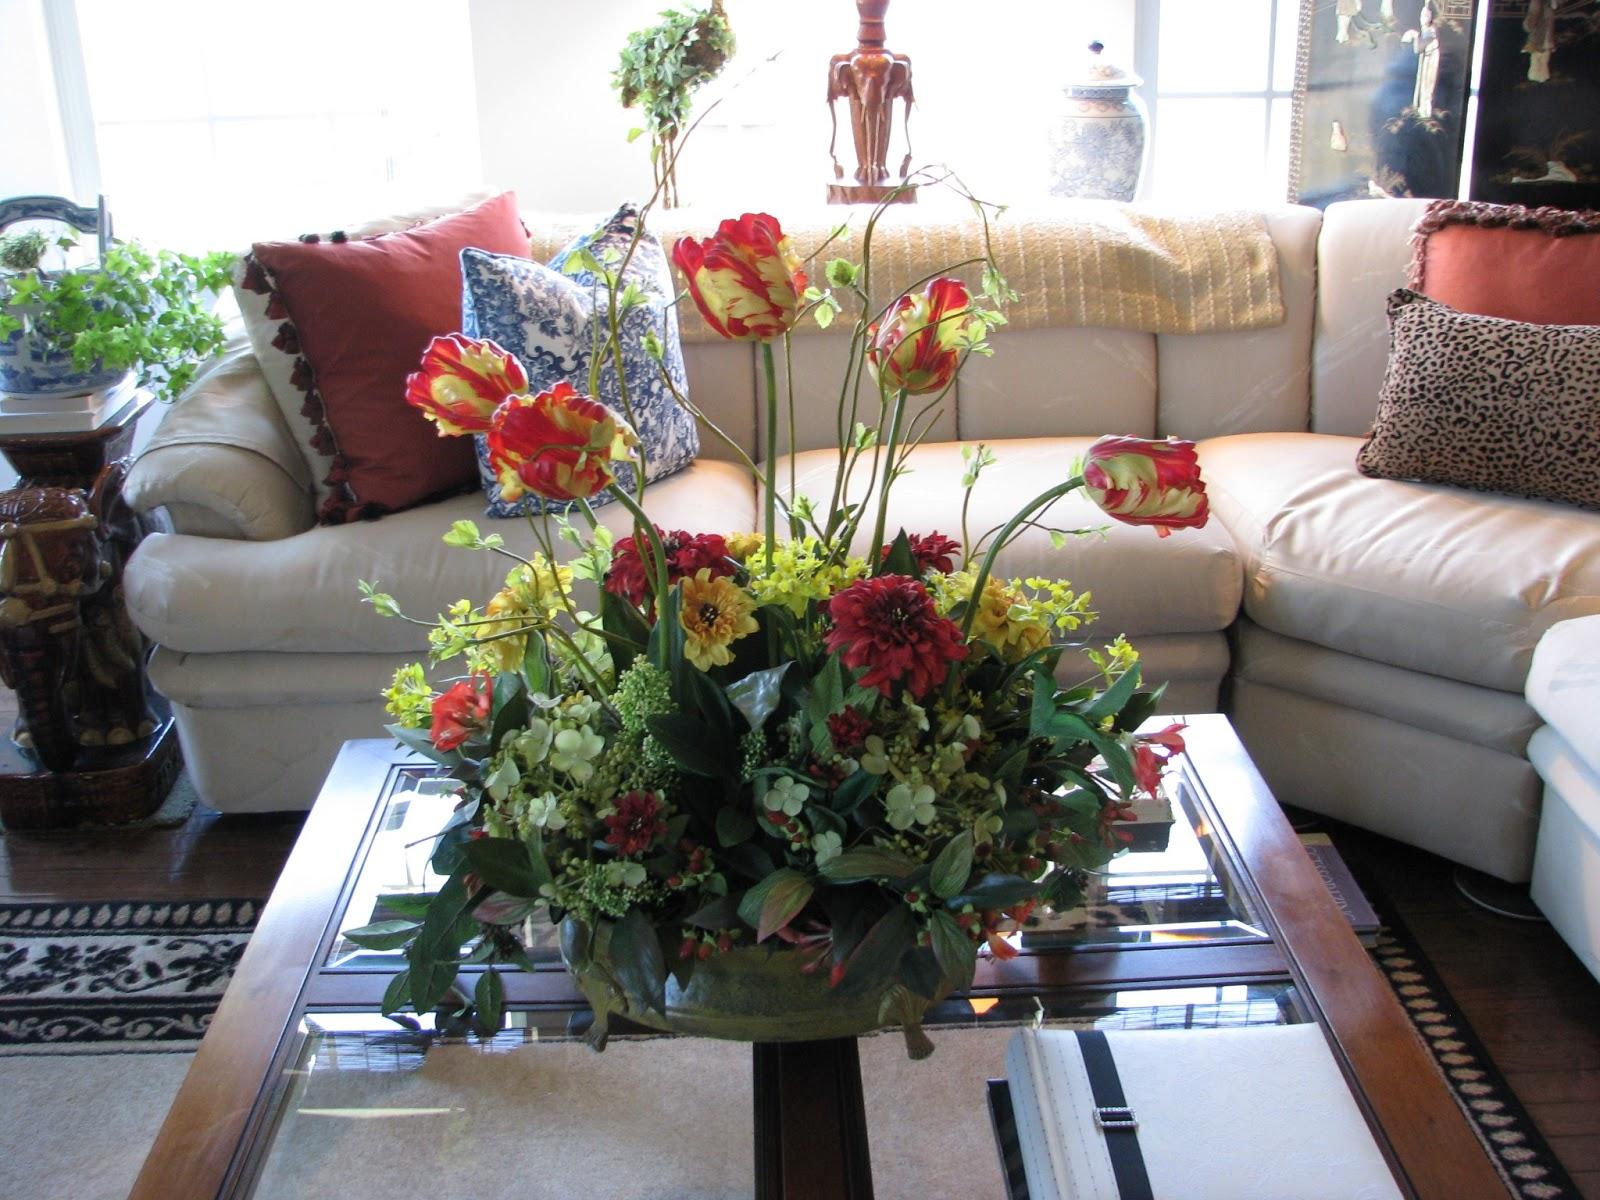 Tons Of Flowers In This Arrangement Hydrangeas Gerber Daisies Berries And Beautiful Ruffled Tulips